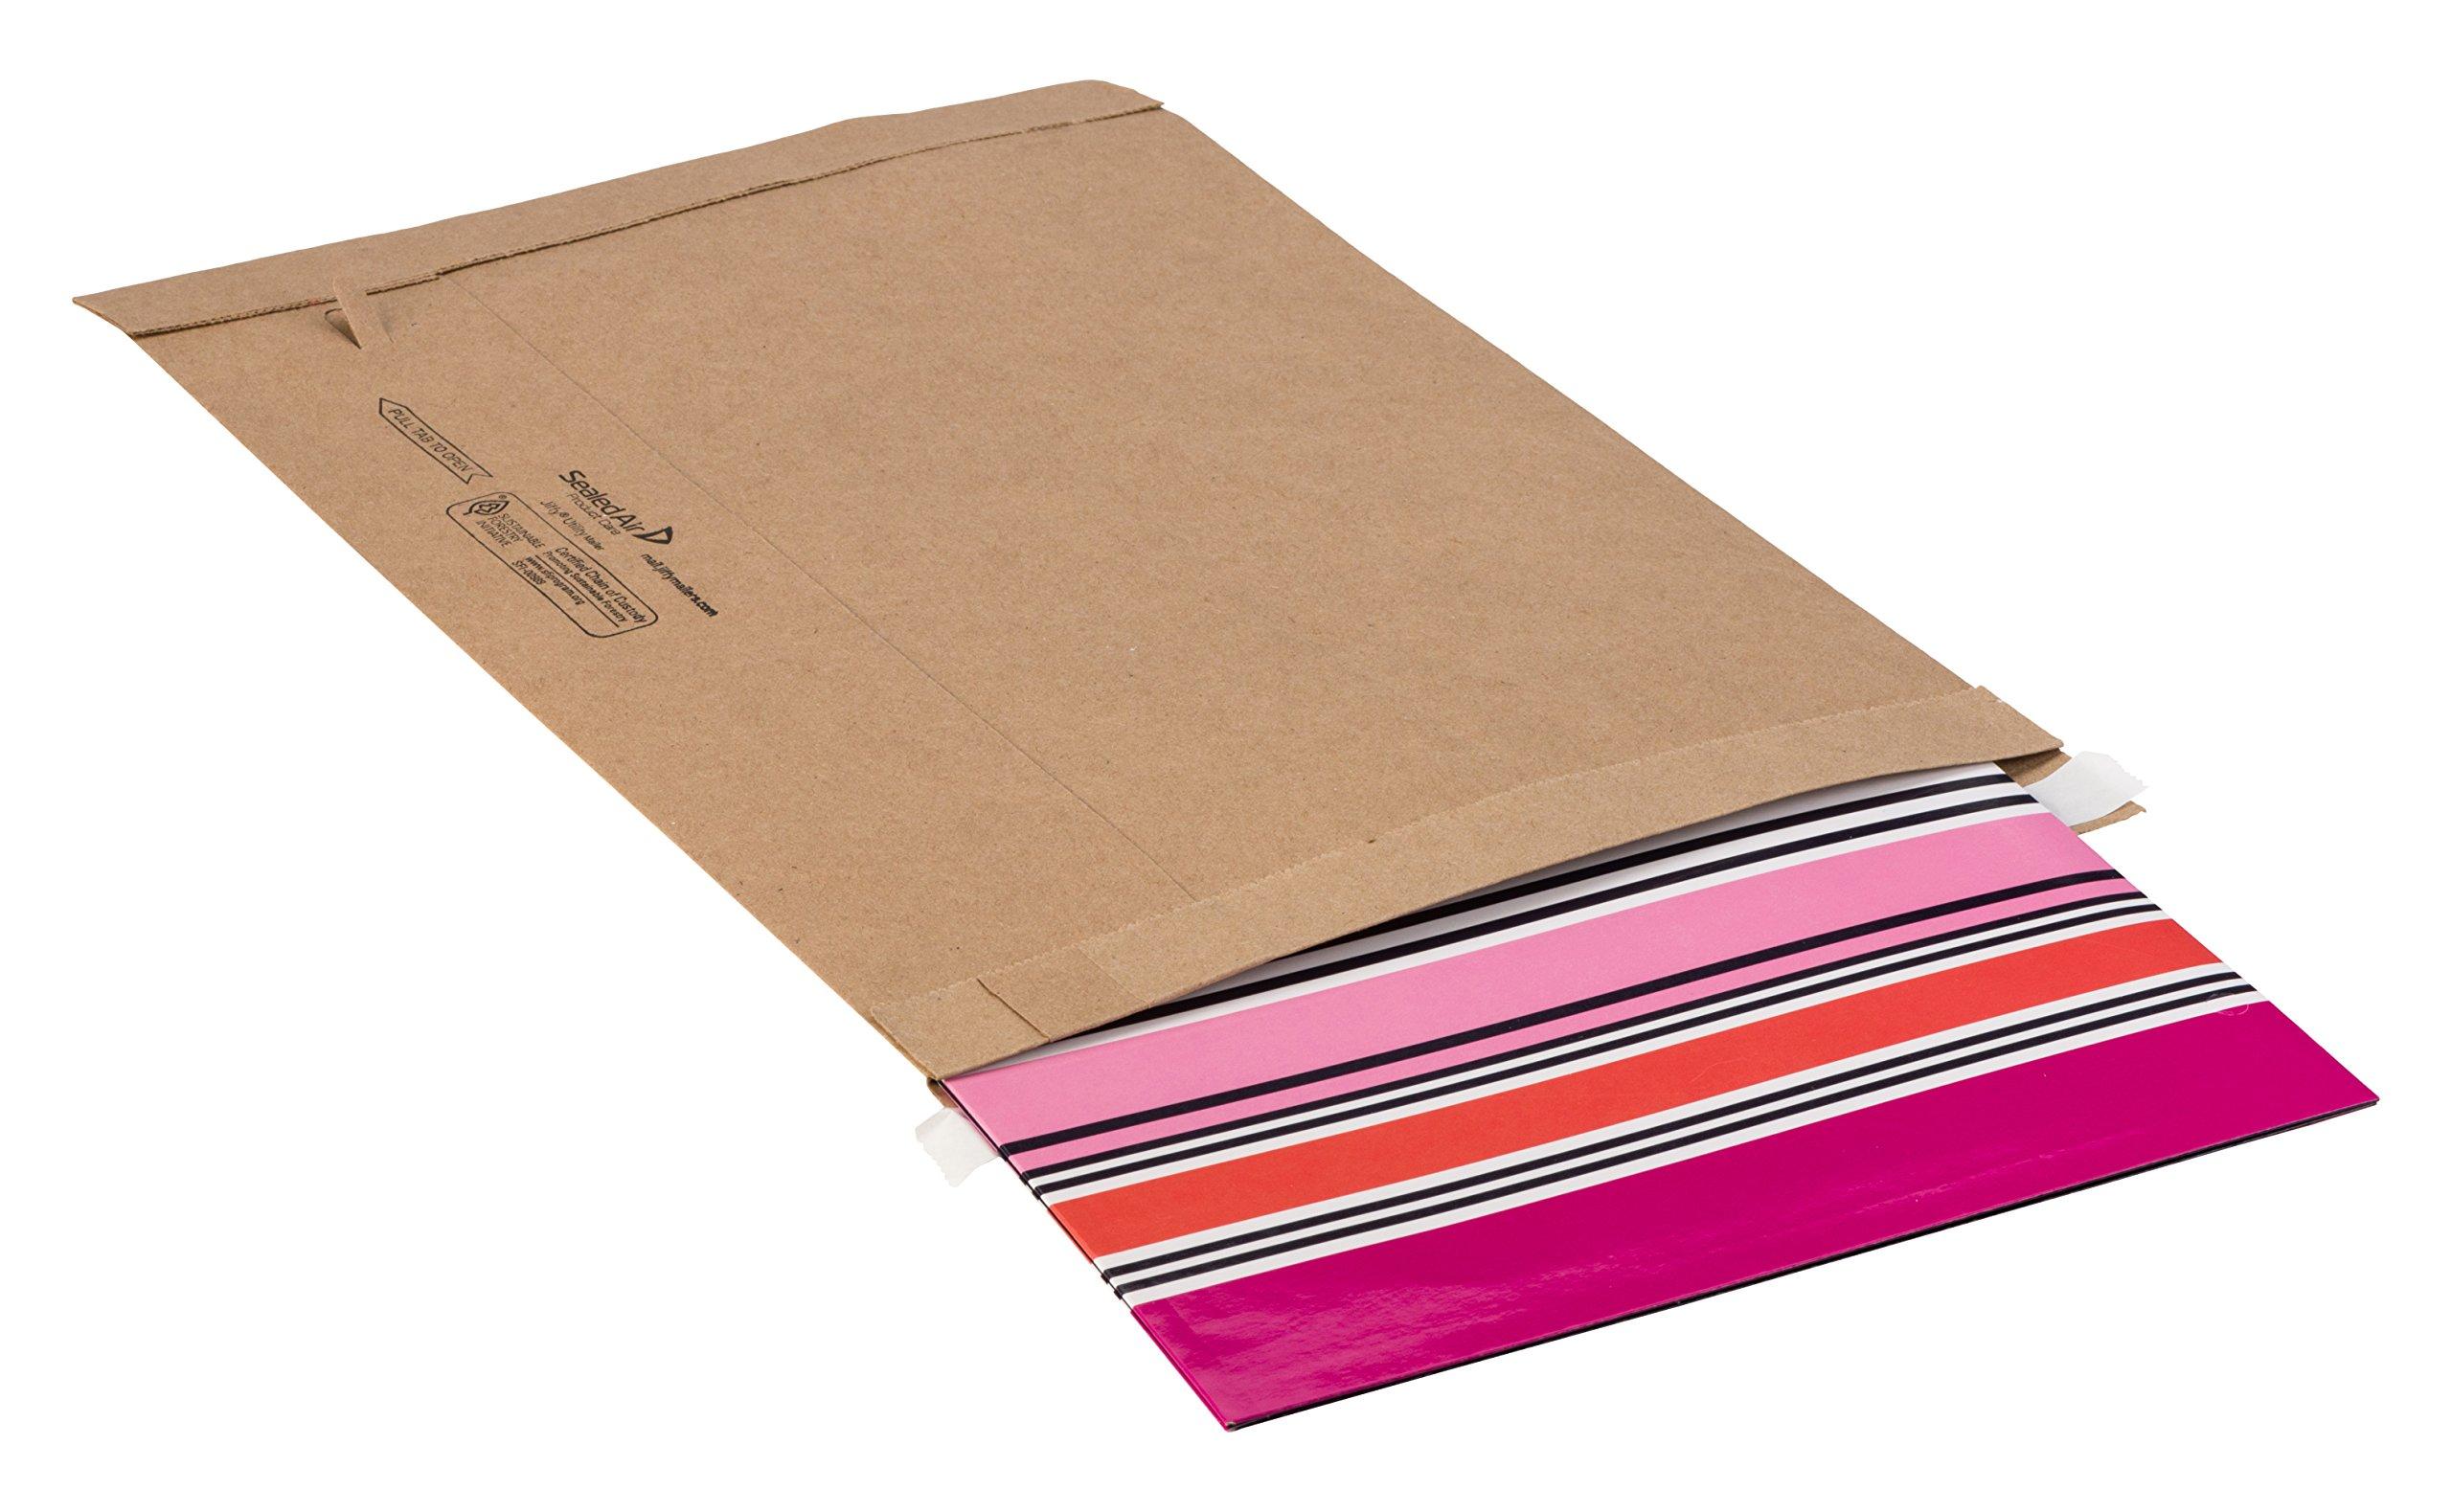 Jiffy Utility Mailer Natural Kraft Self Seal Mailer 65627#5 10-1//2 x 16 Pack of 250